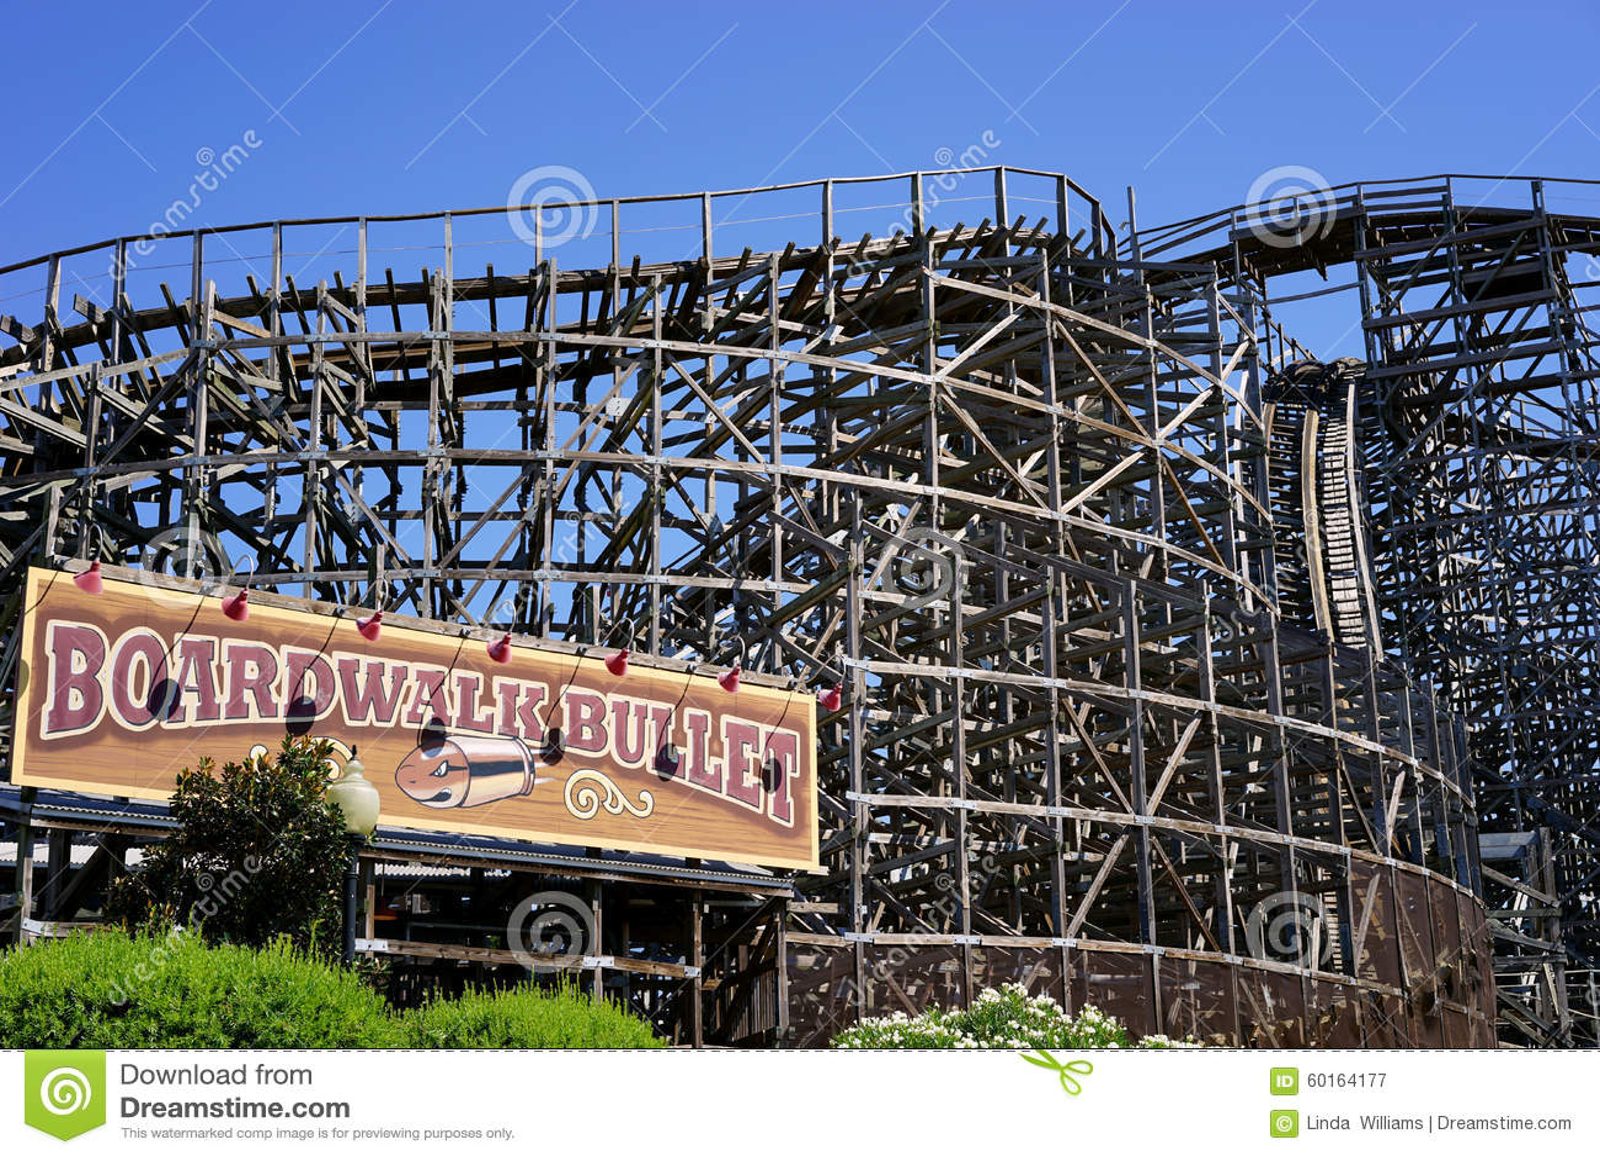 Boardwalk Bullet - wooden roller coaster